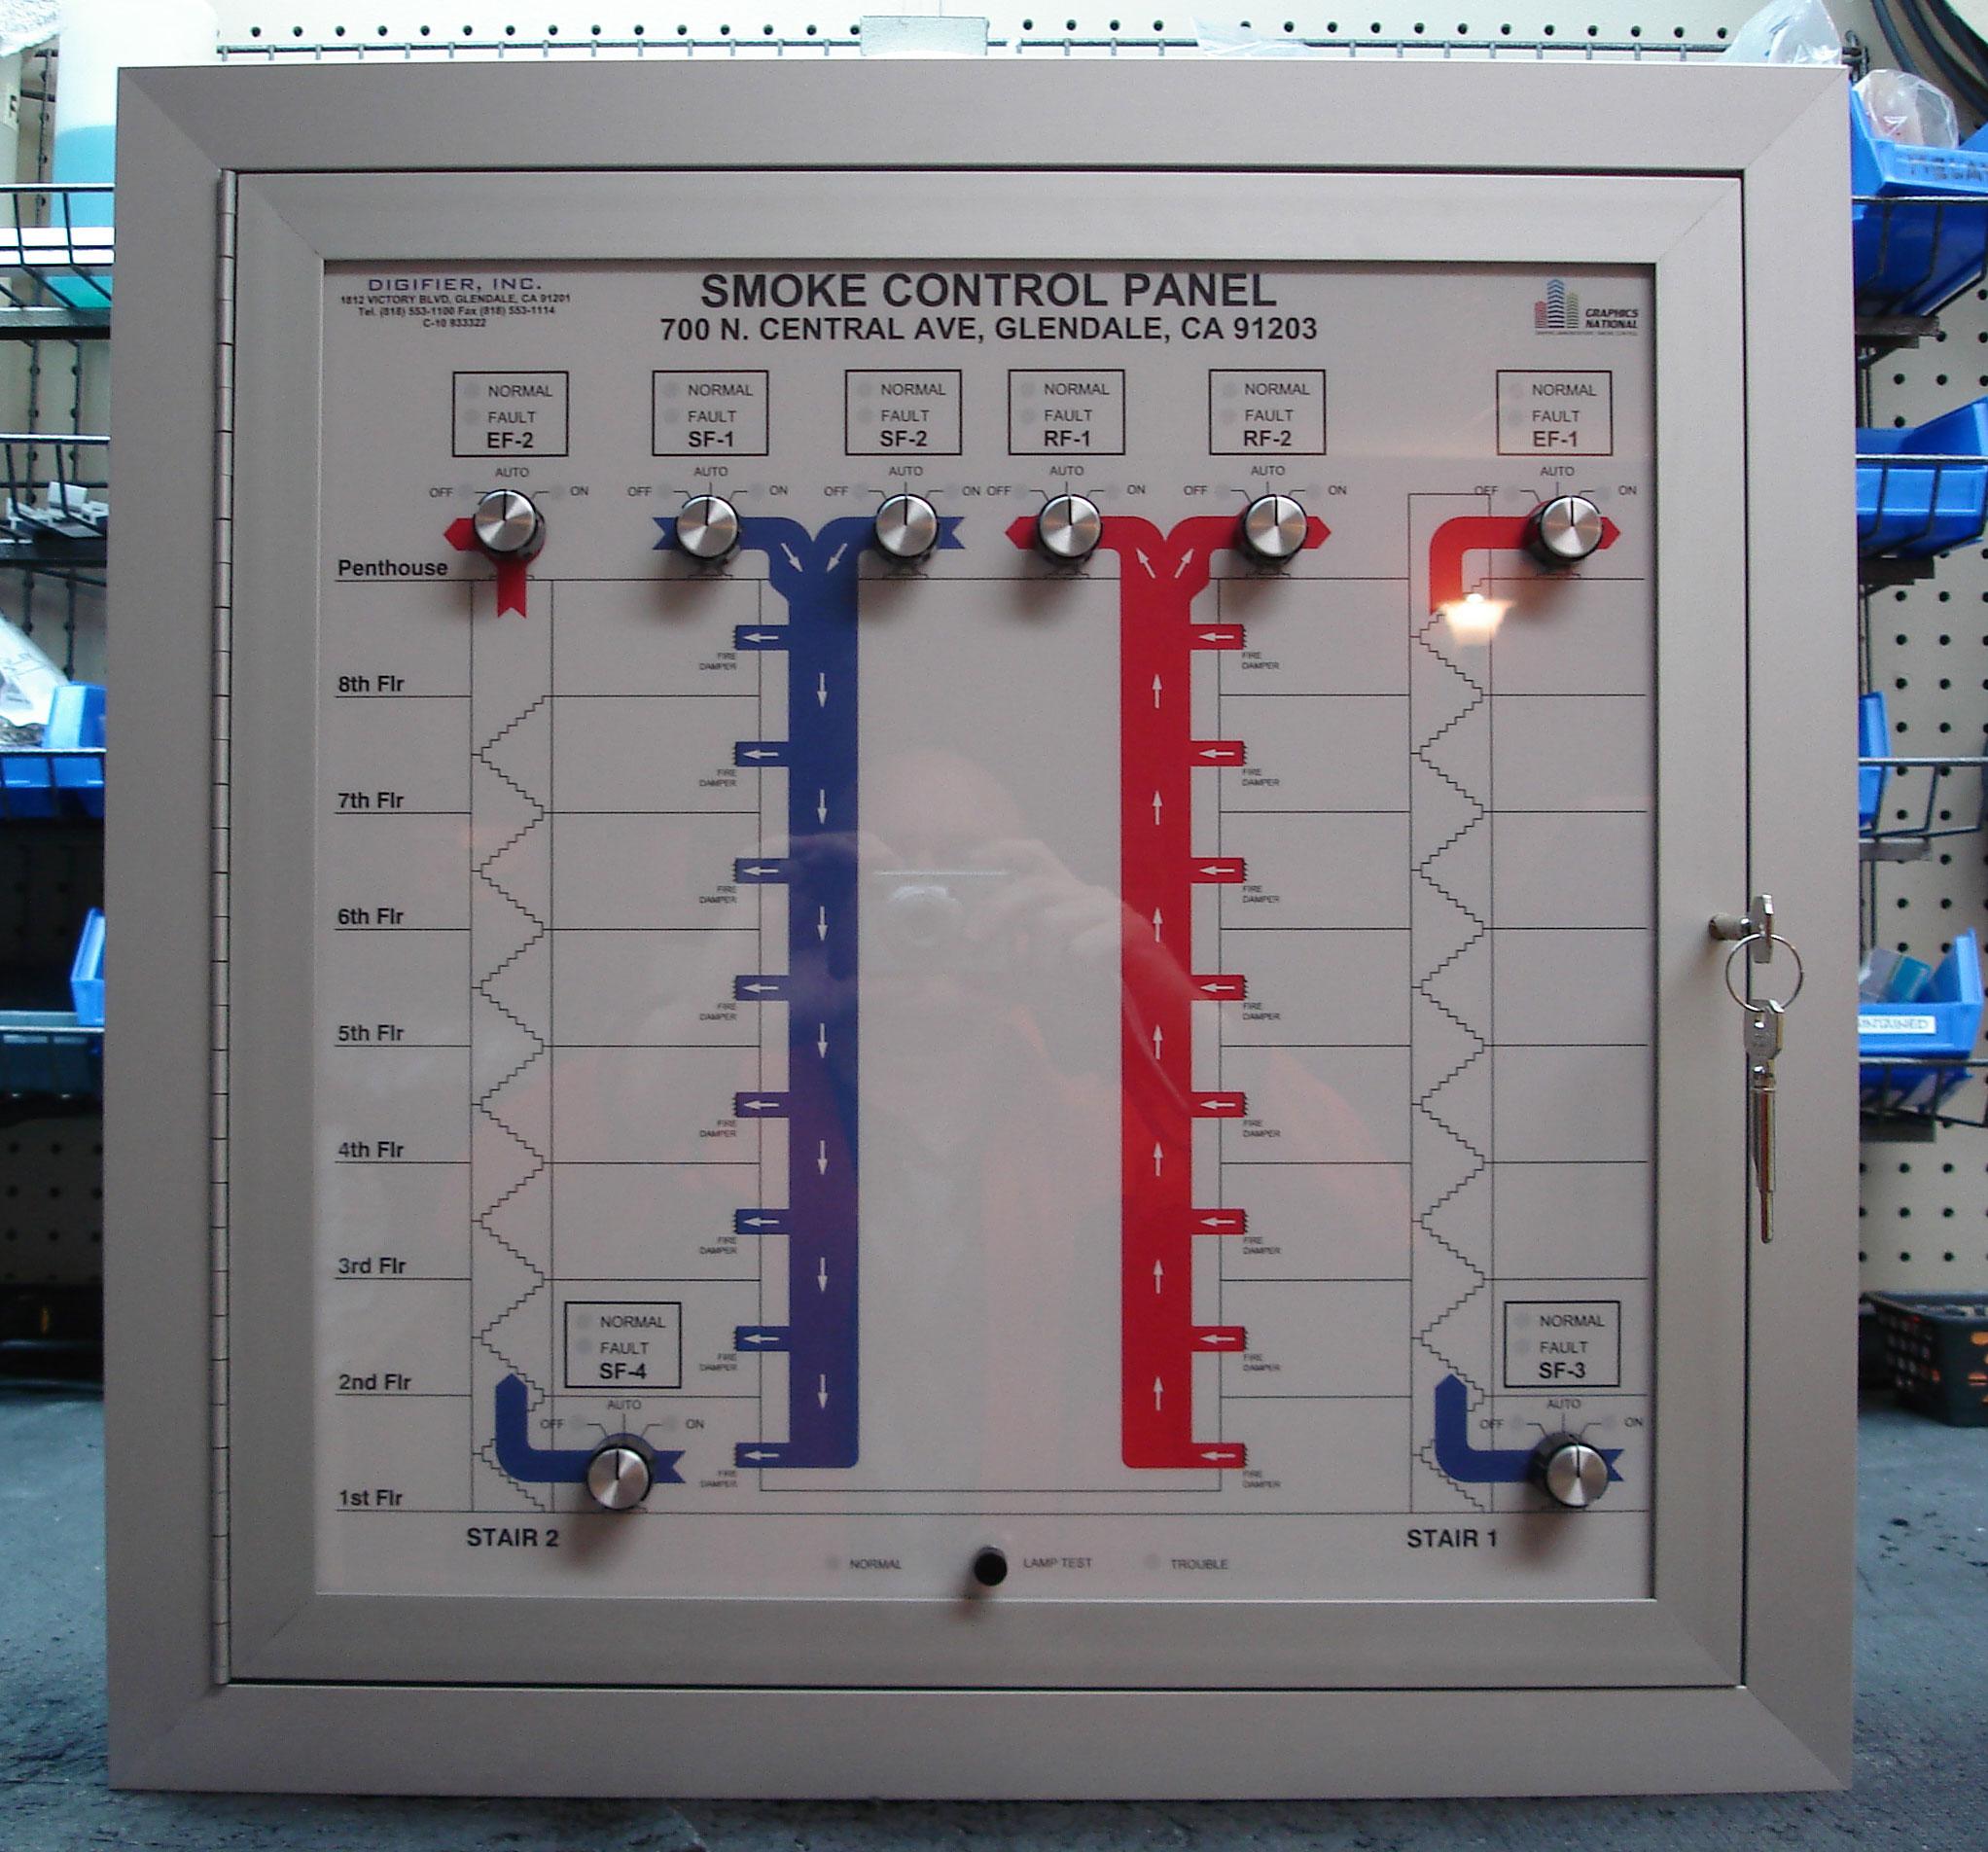 UUKL Smoke Control Panel